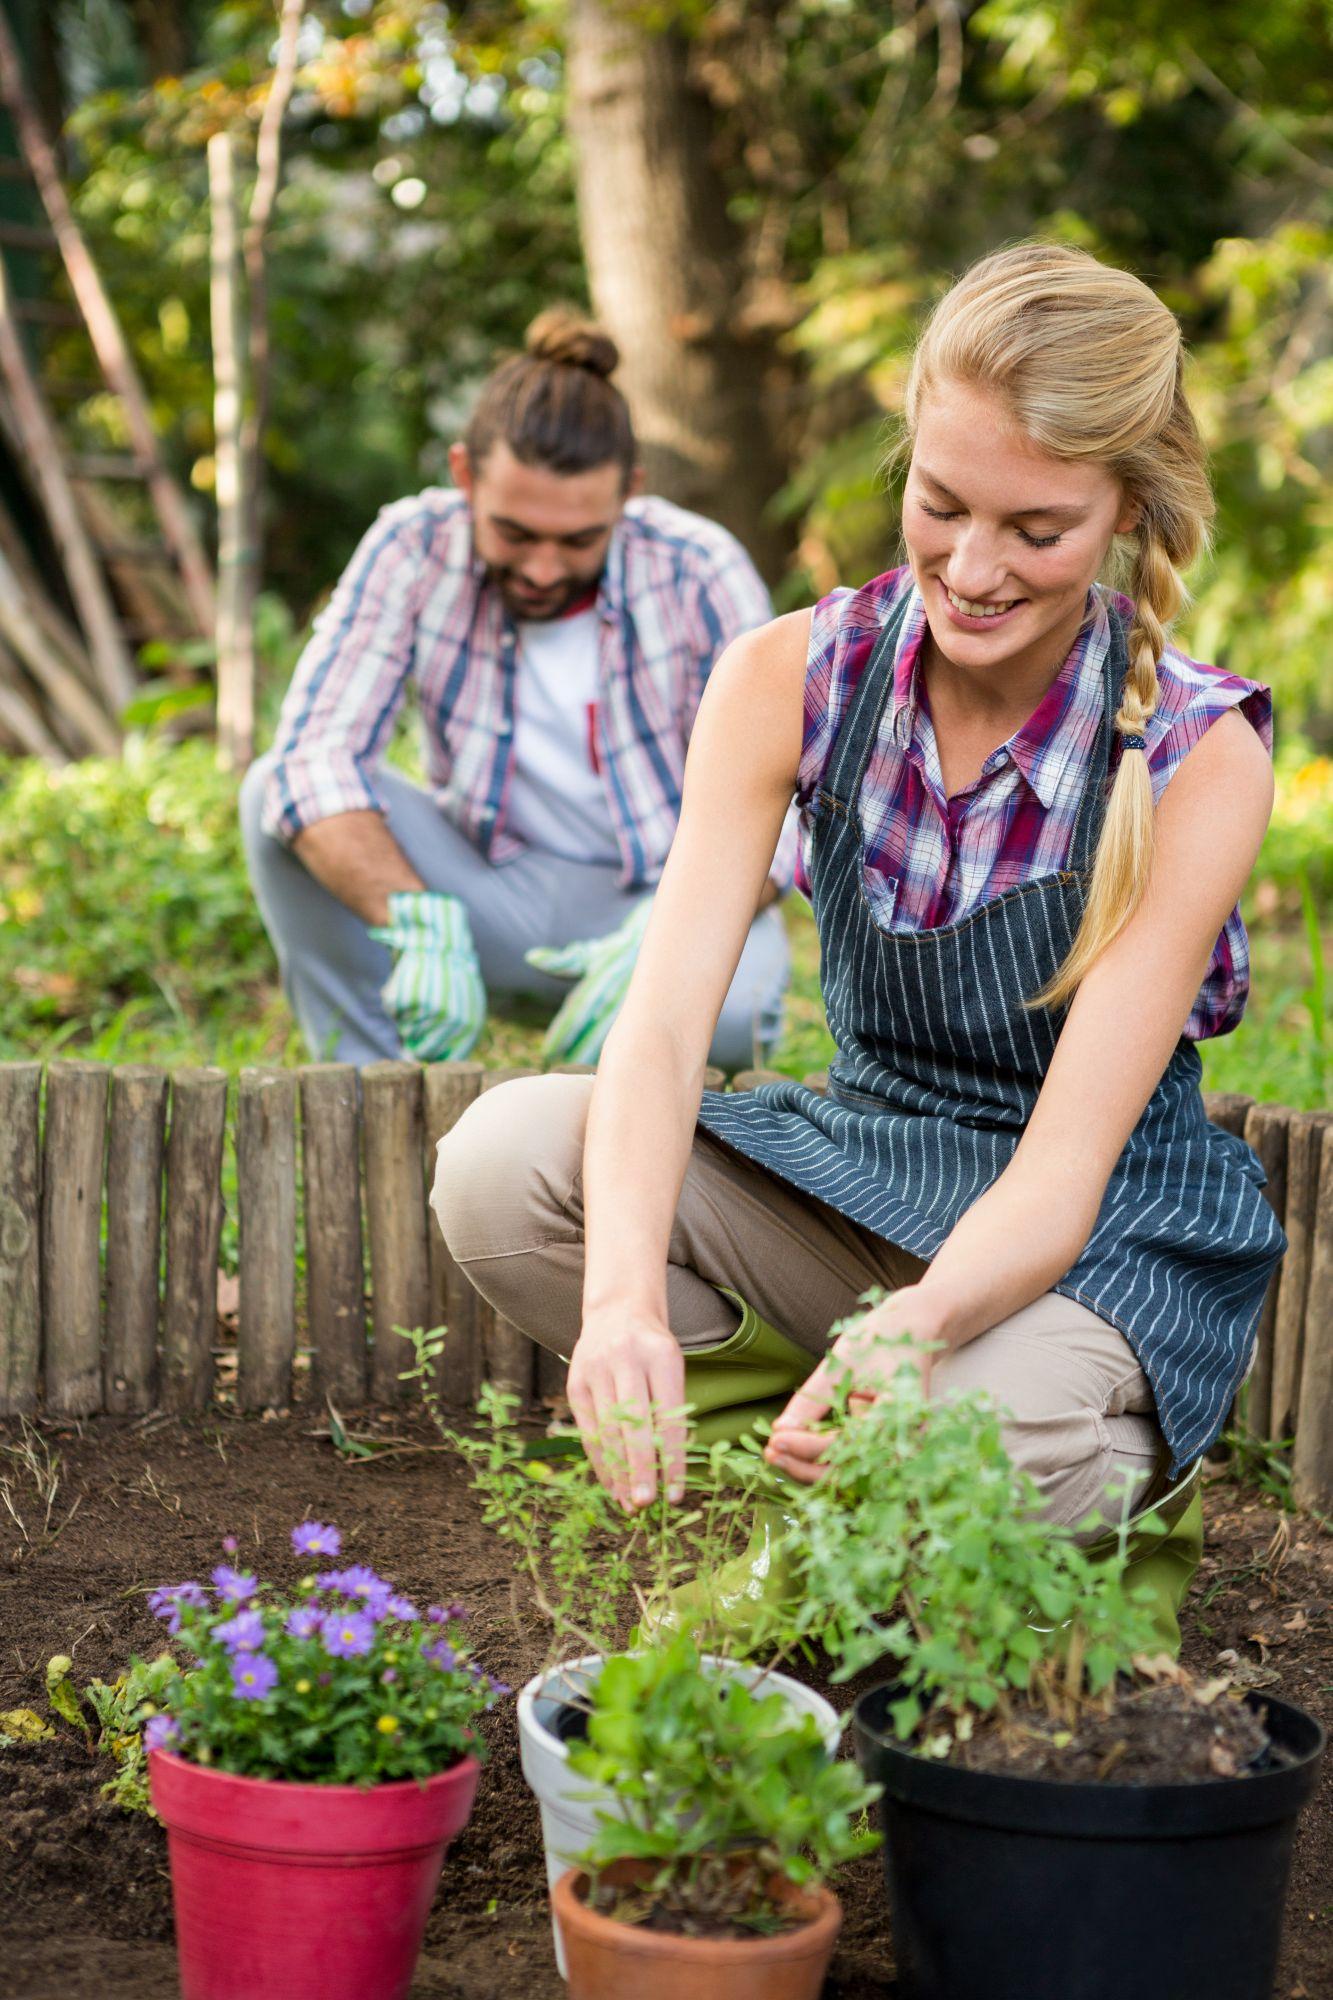 happy-female-gardener-plant-at-garden-6YJNQUT